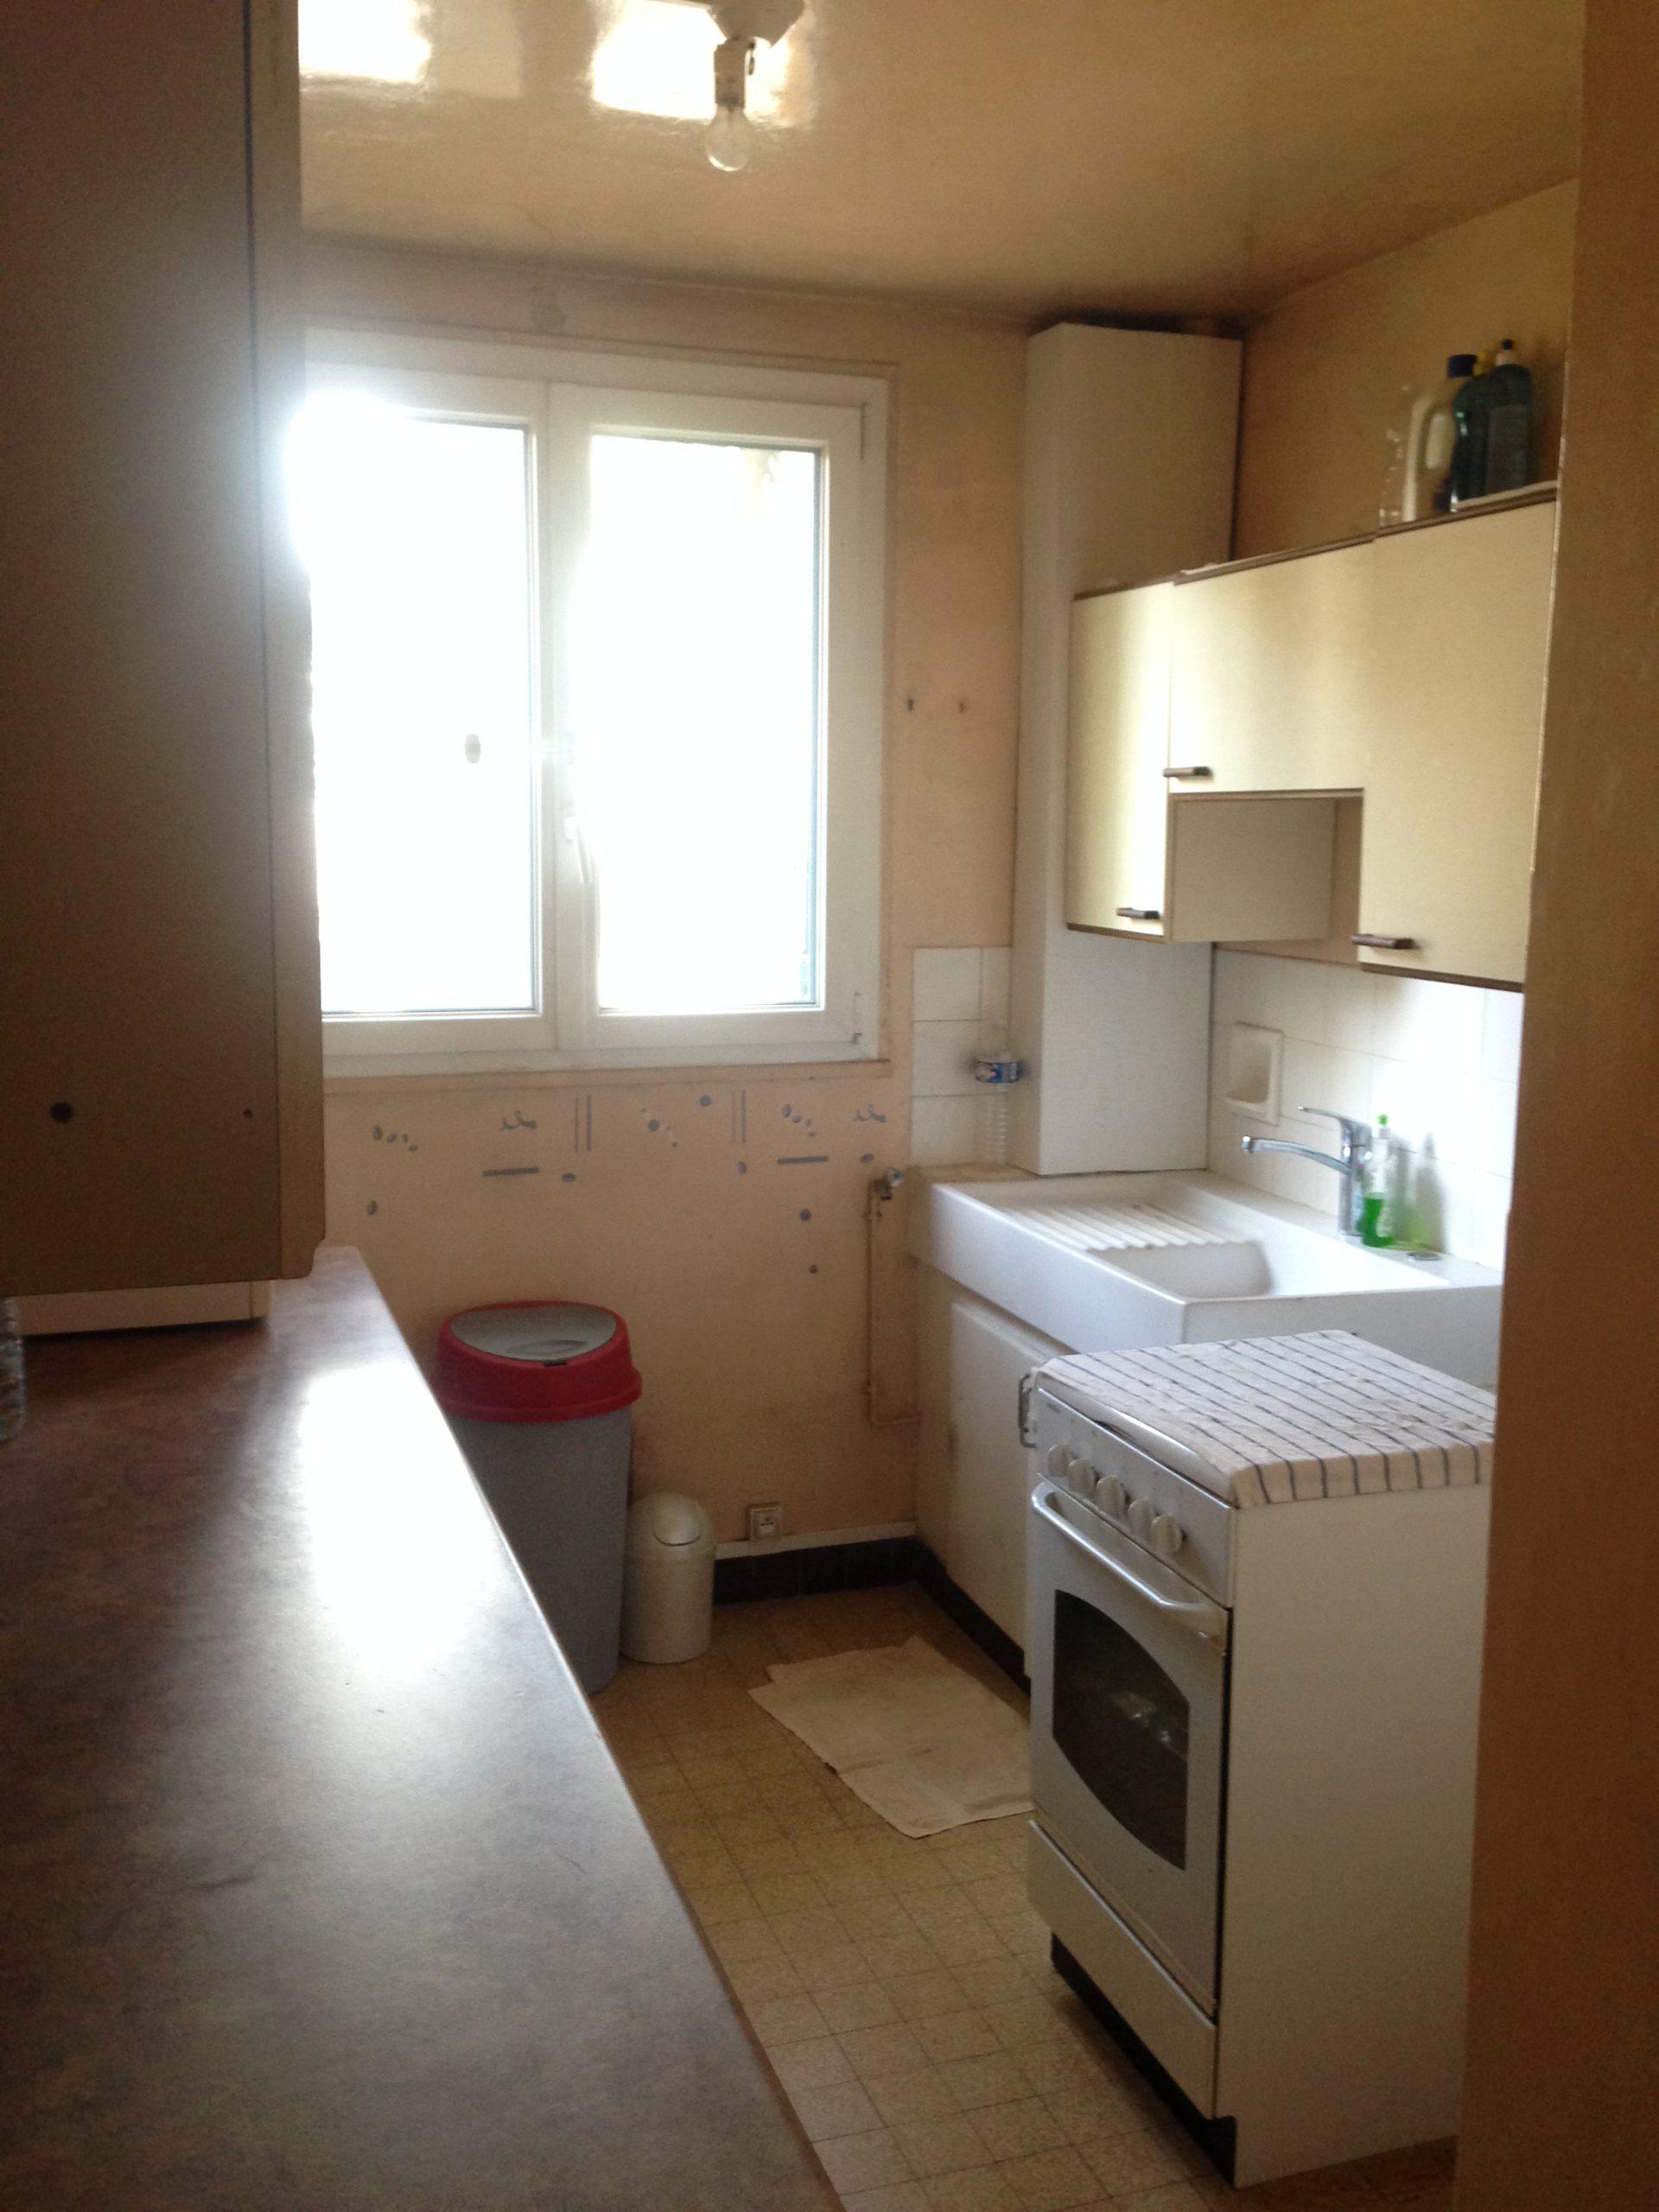 Rénovation de cuisine à Viroflay (78)